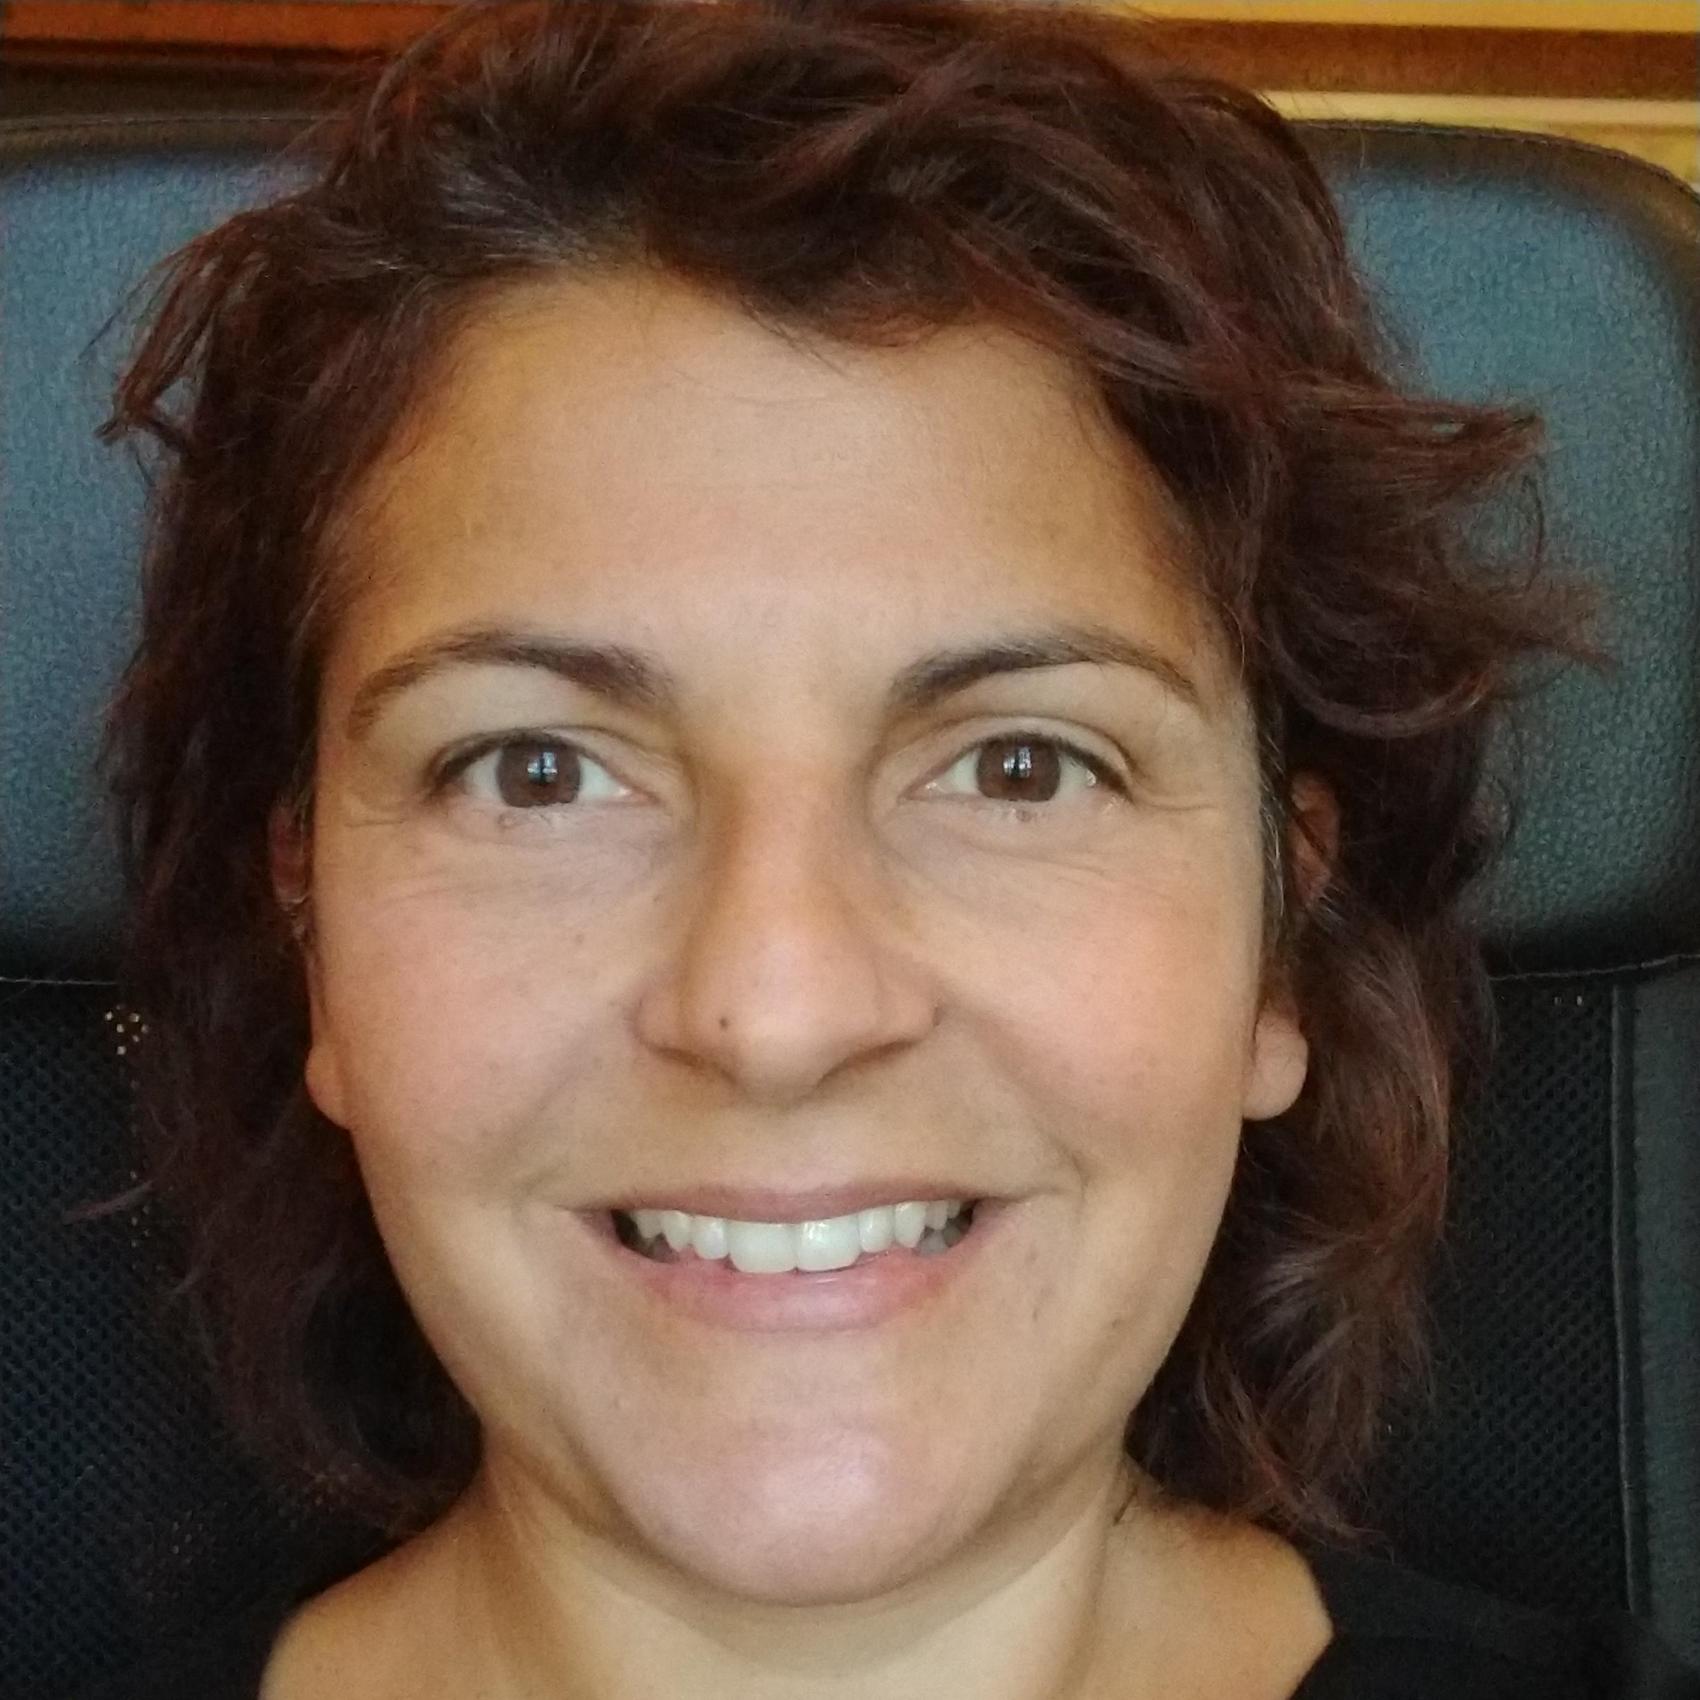 Yvonne Sandner